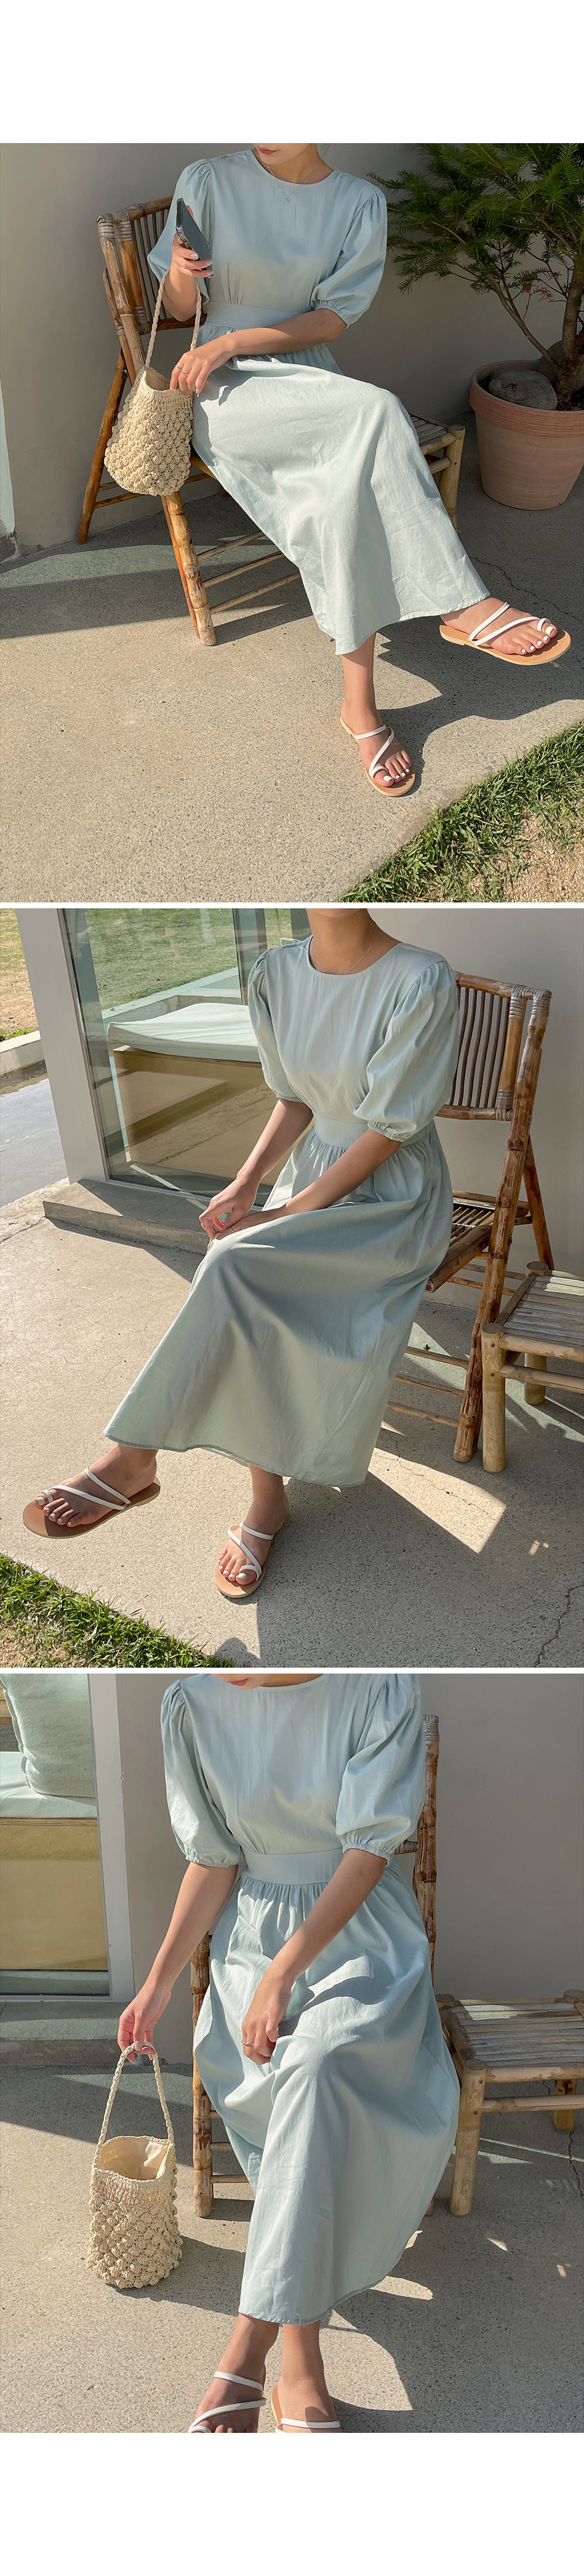 Back Cut Out Dress Midi Dress-Holiholic